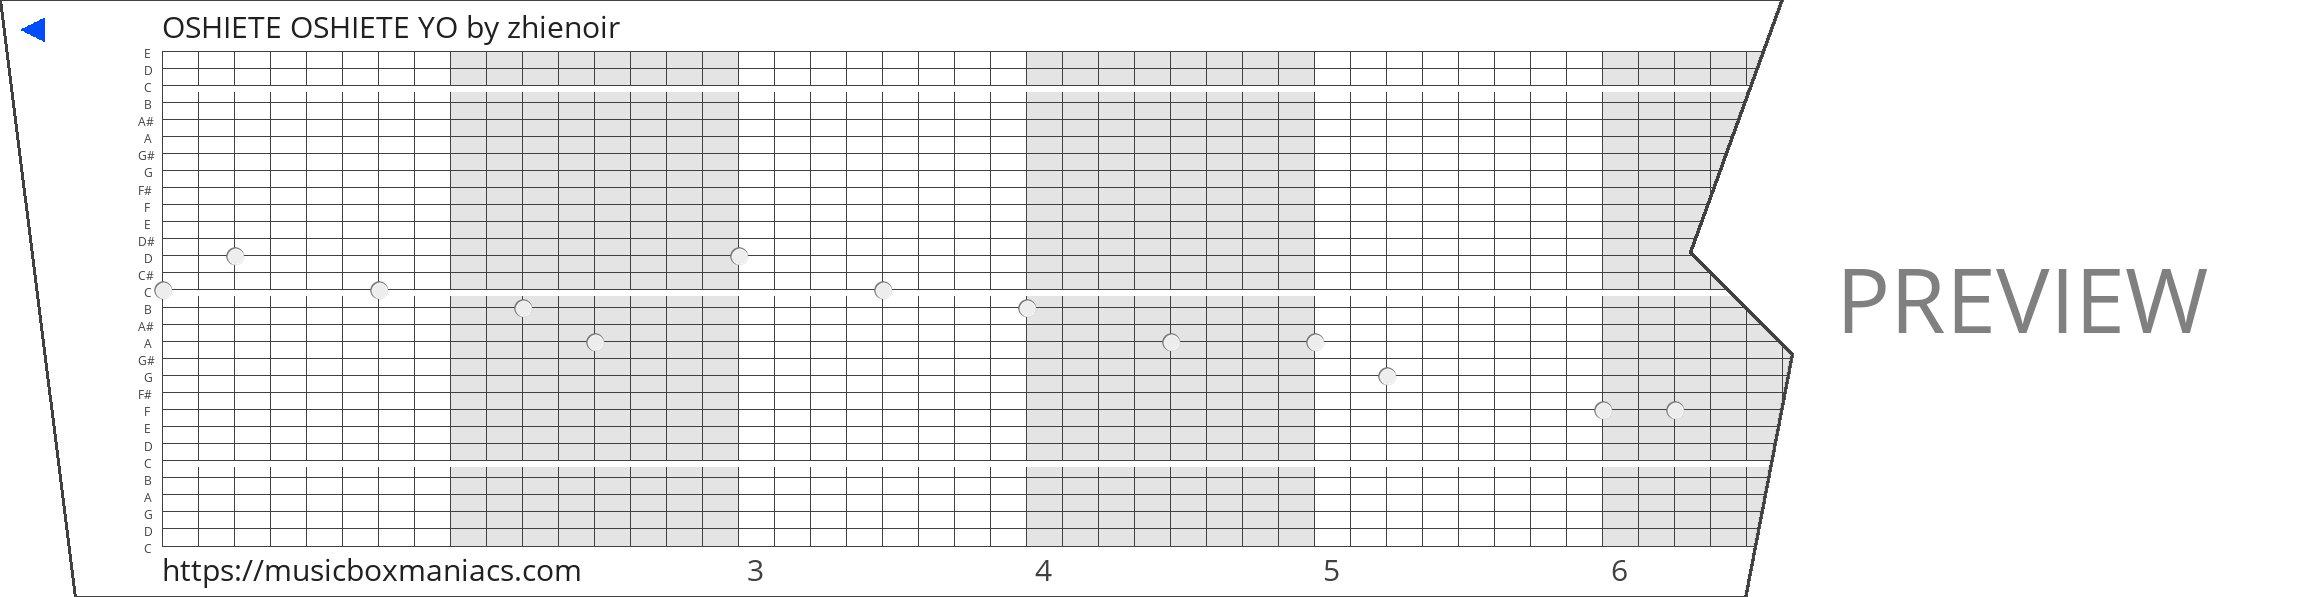 OSHIETE OSHIETE YO 30 note music box paper strip